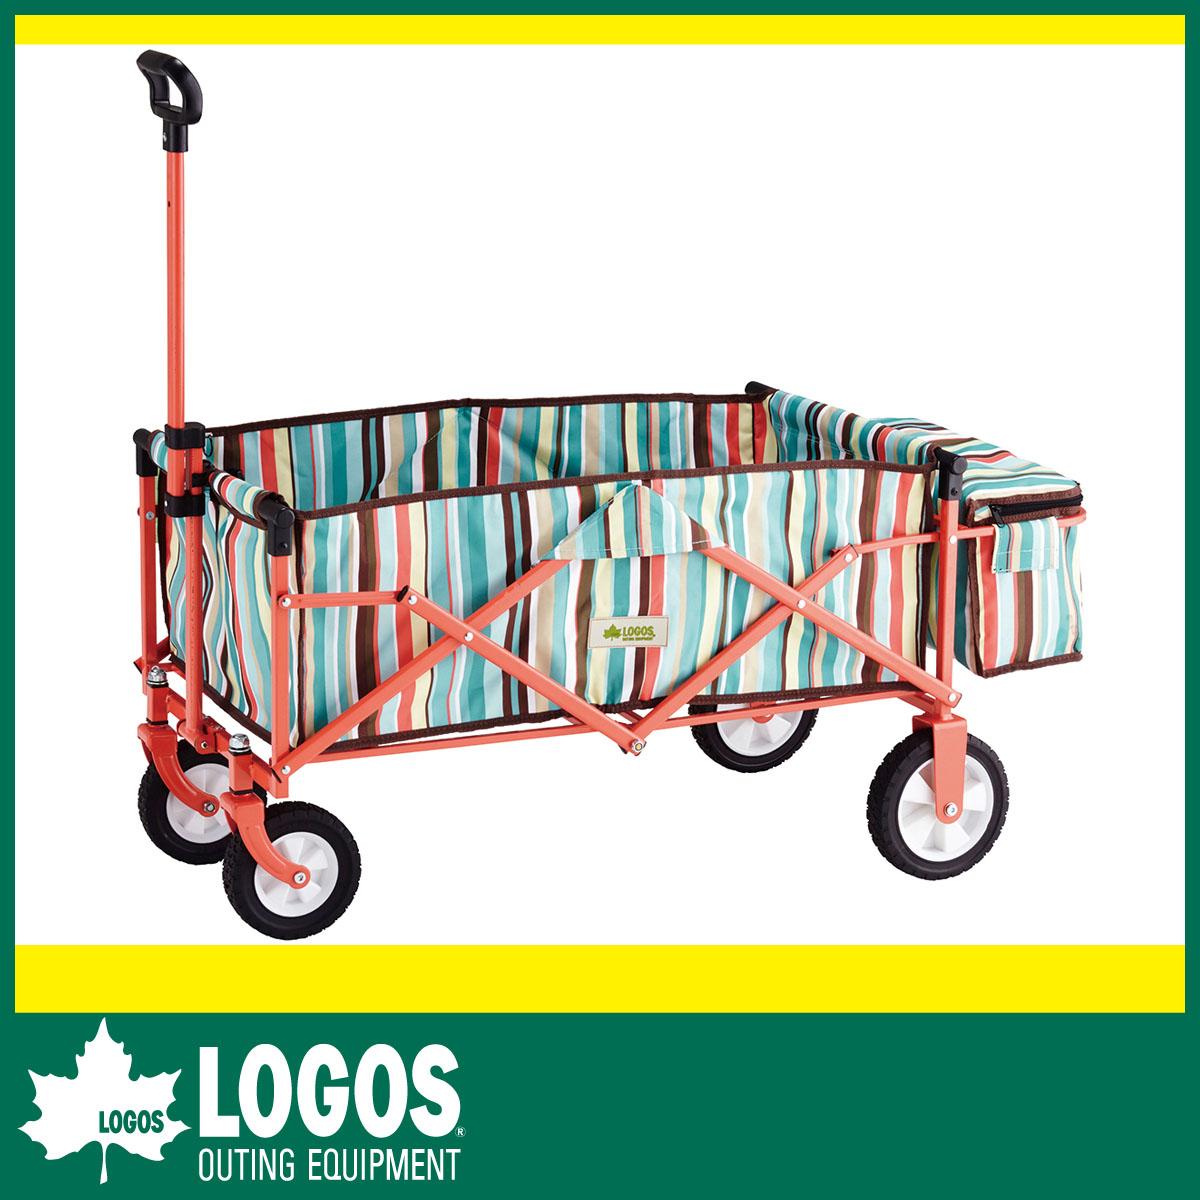 【LOGOS ロゴス】 重い荷物も一気に運べる! 大容量キャリー 丸洗いストライプ スマートキャリー with BOX(ブルー)